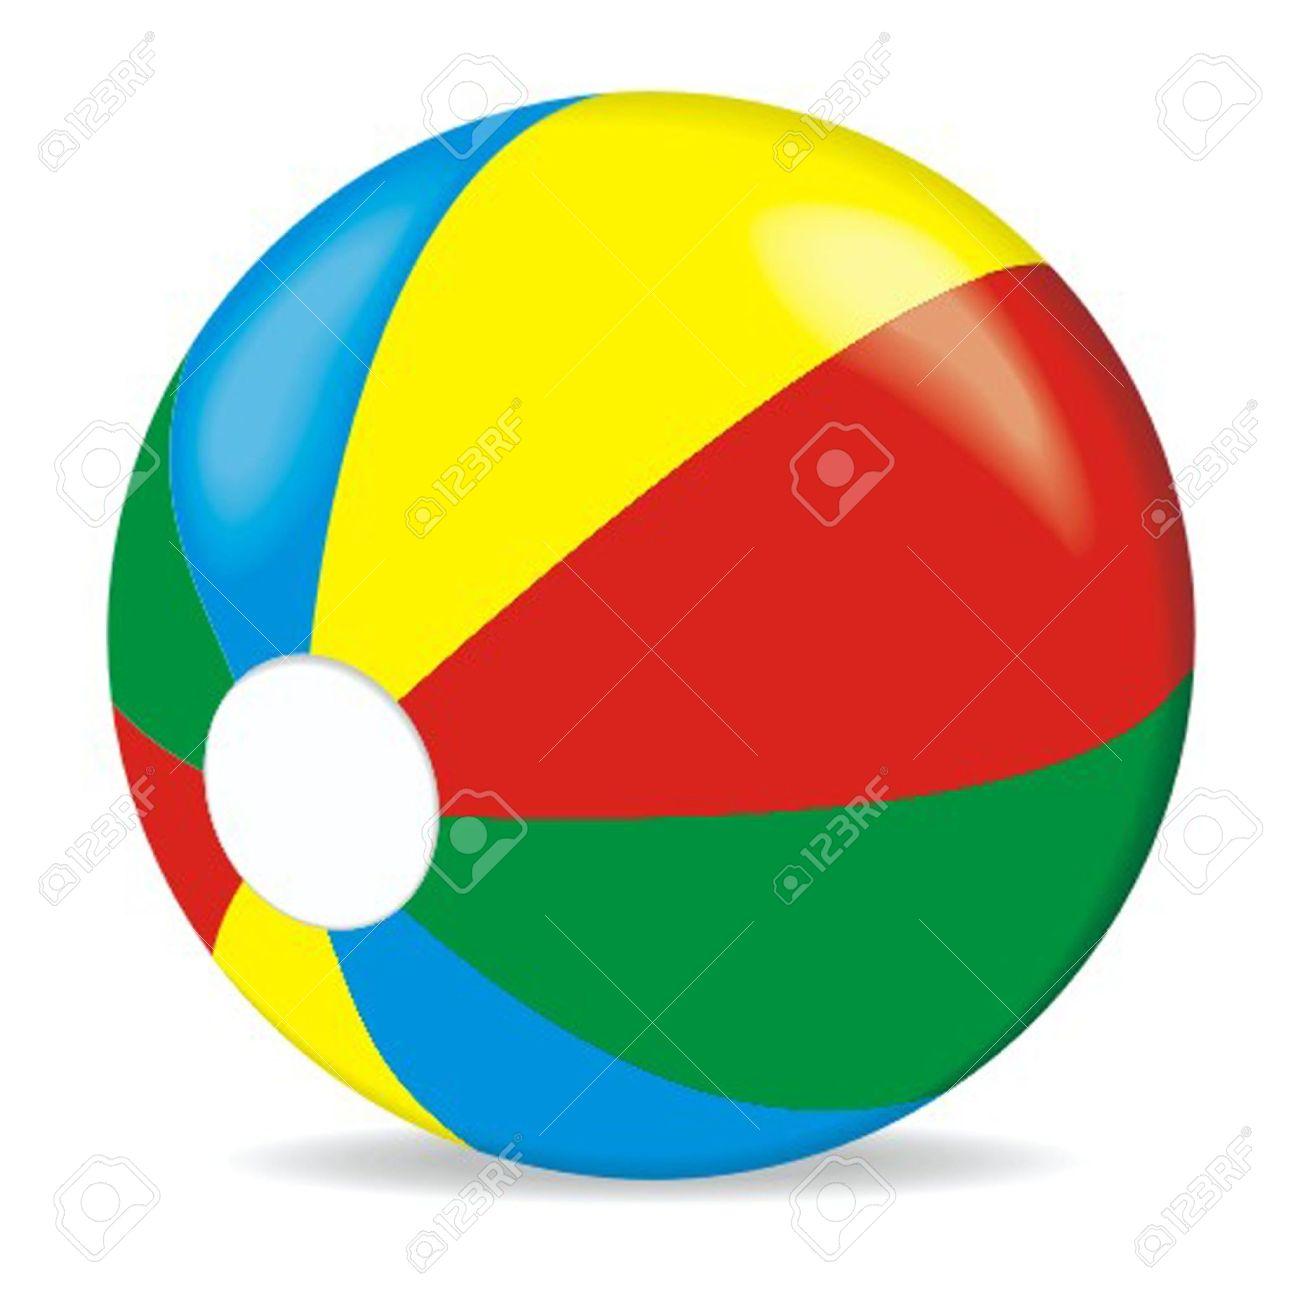 color ball - 13330128